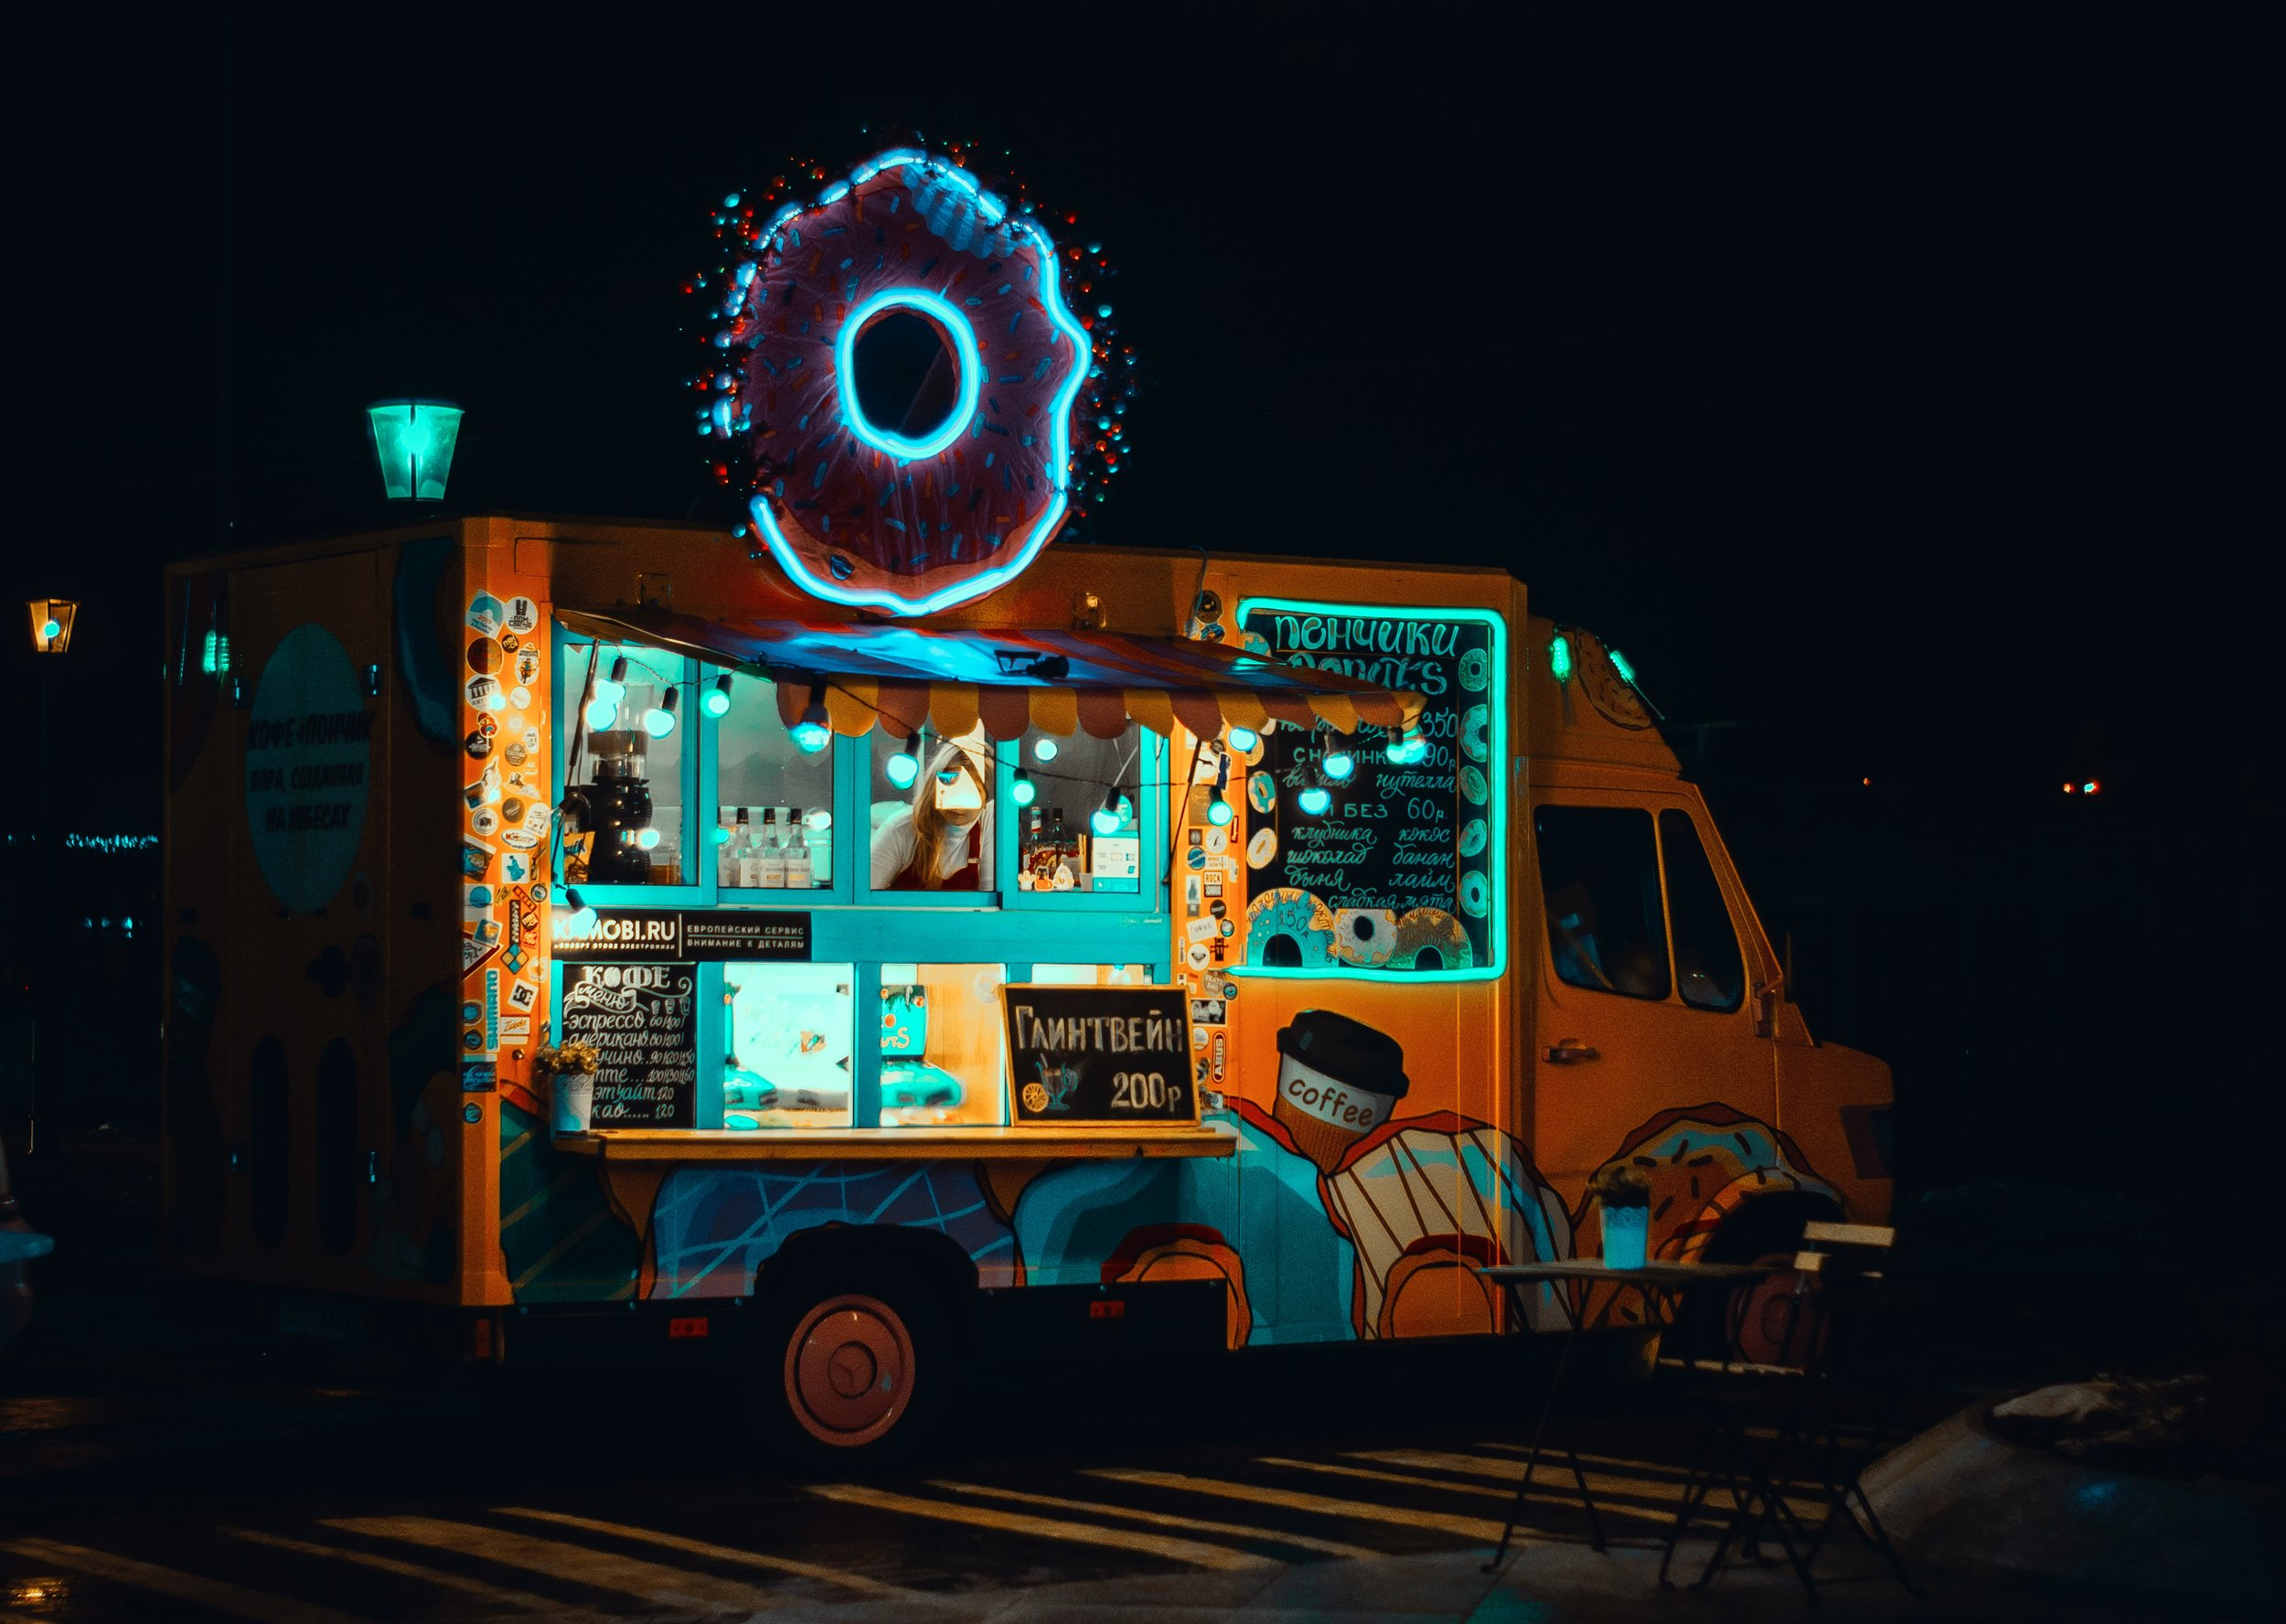 food-truck-illuminated-light-1766686.jpg